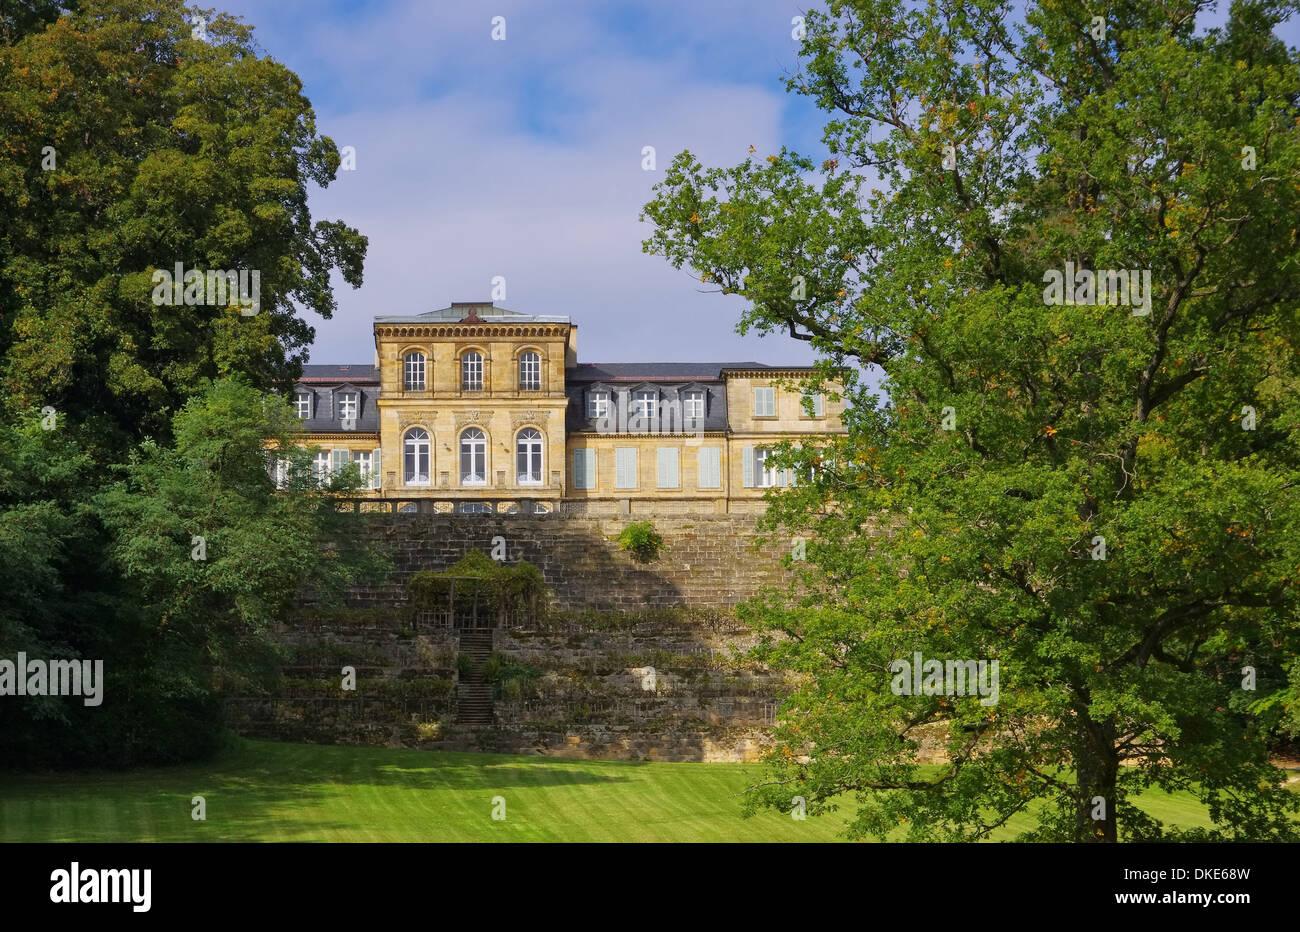 Bayreuth Schloss Fantaisie - Bayreuth Palace Fantaisie 03 - Stock Image